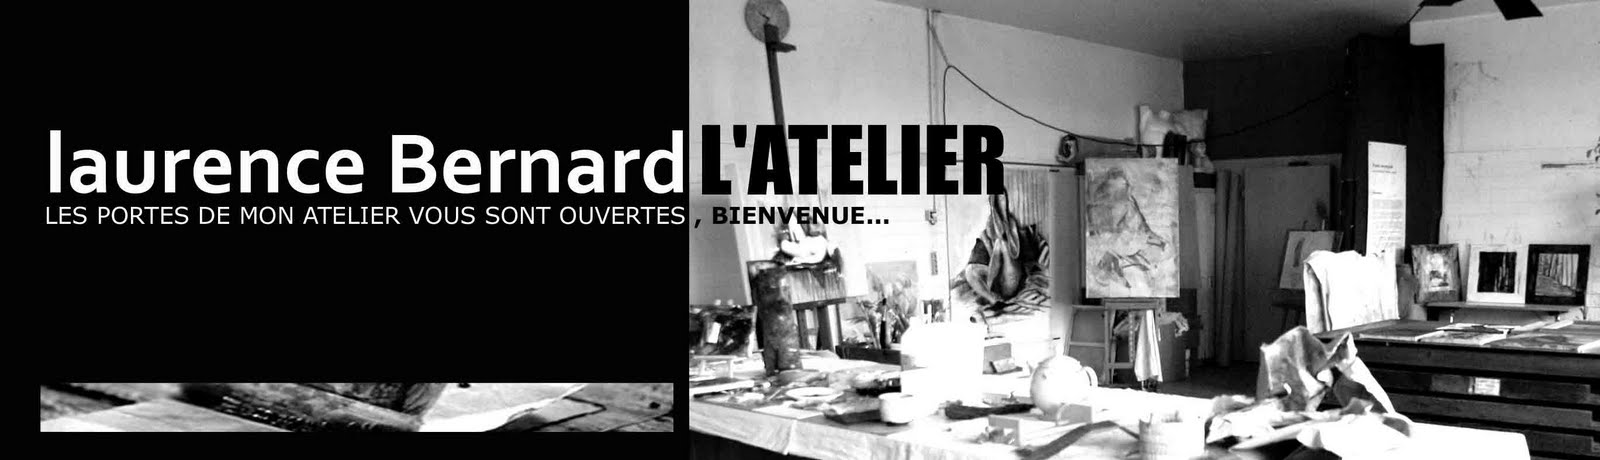 laurence bernard        L'ATELIER